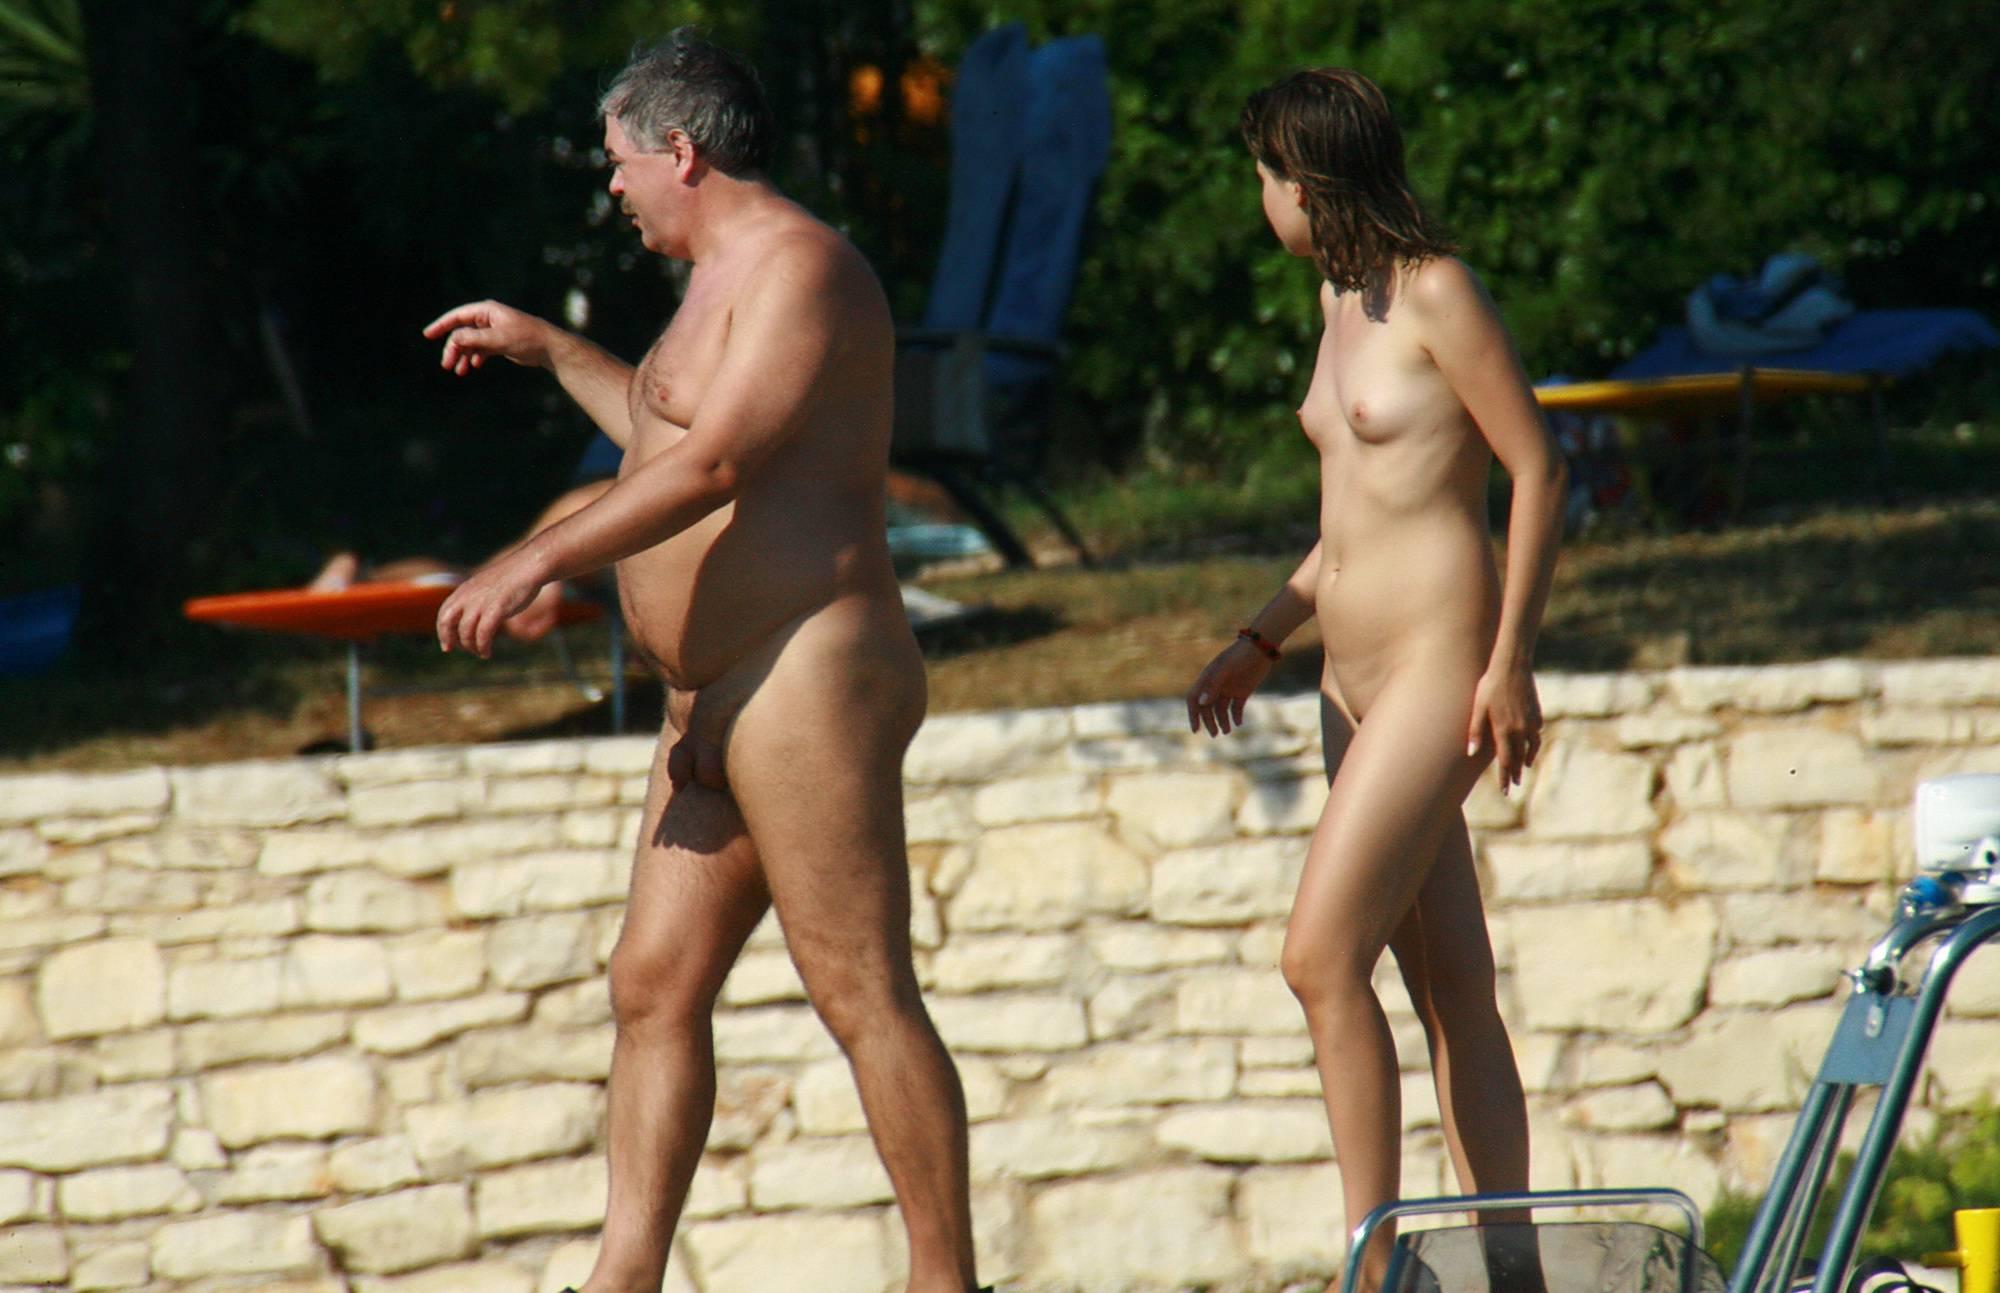 Nudist Photos Strolling On The Veranda - 2